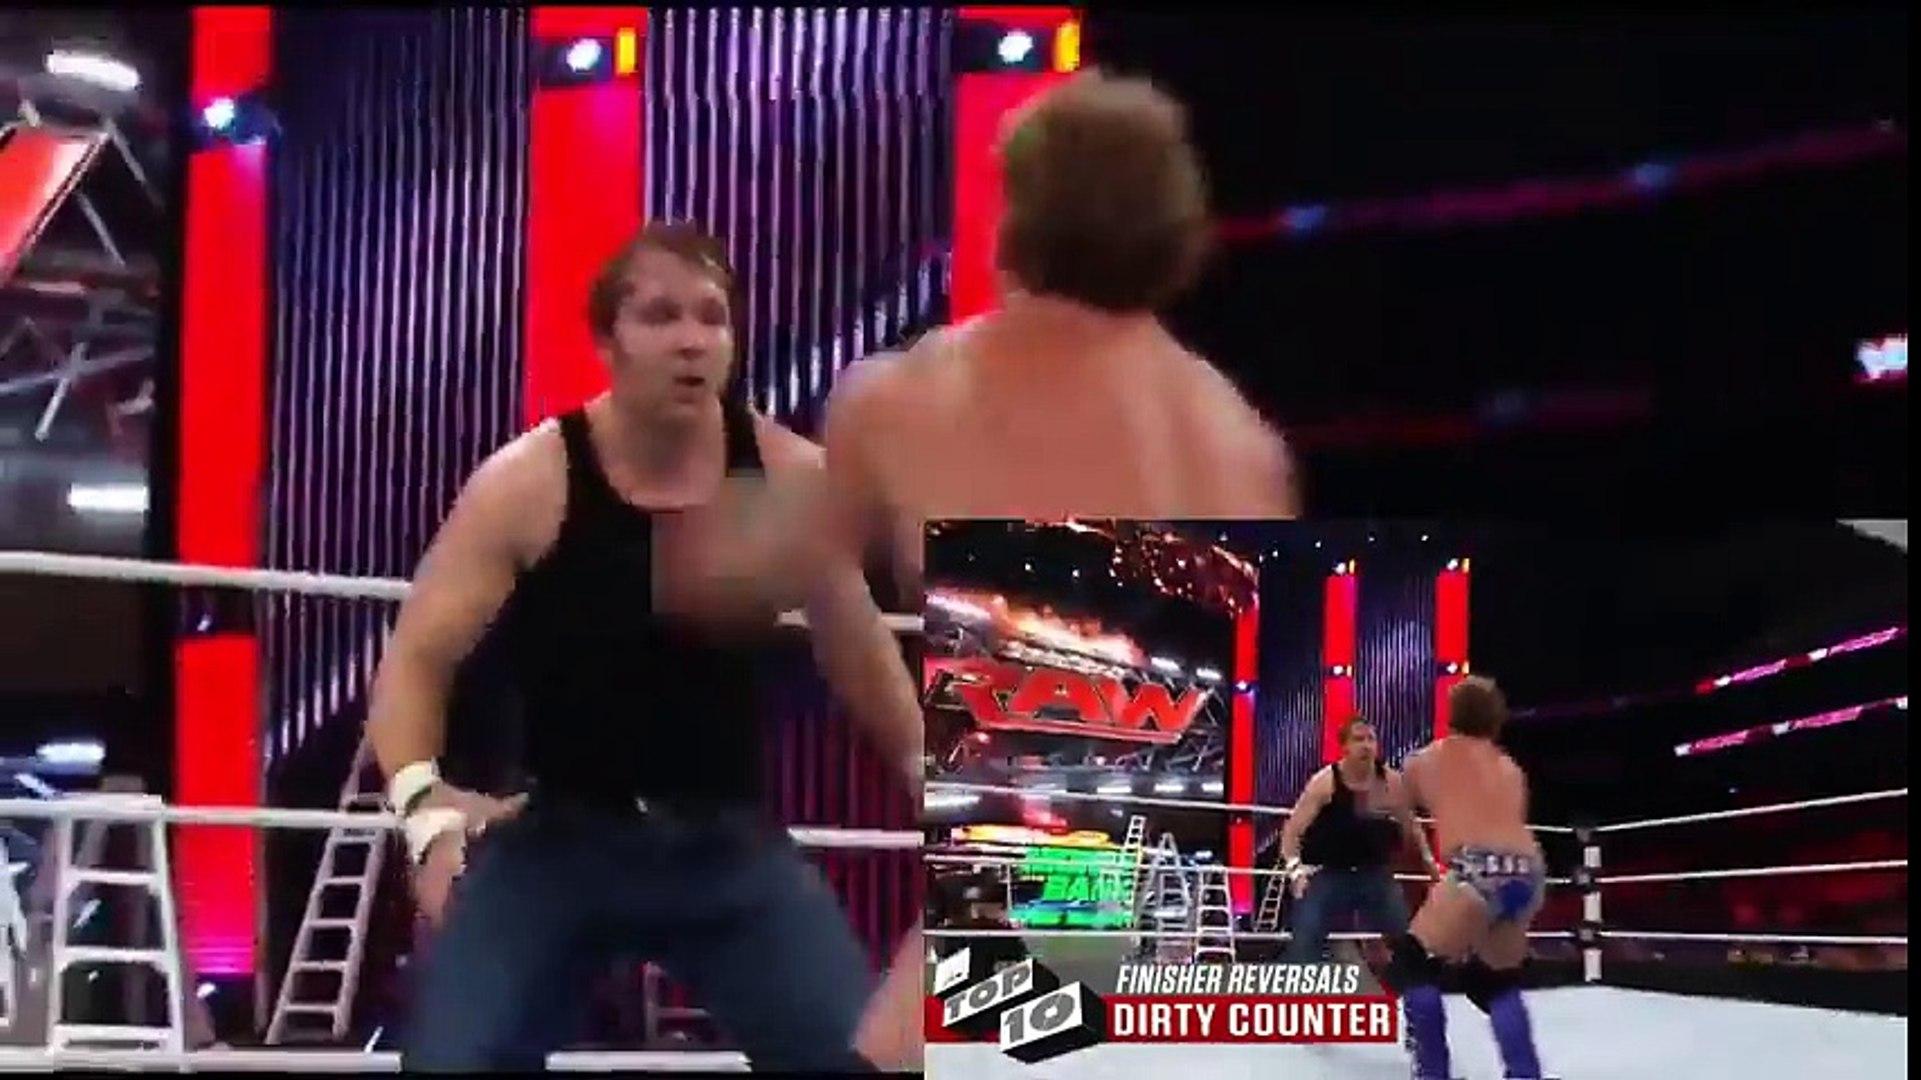 WWE TOP 10 Finisher Reversals WWE Videos WWE Top 10 Videos